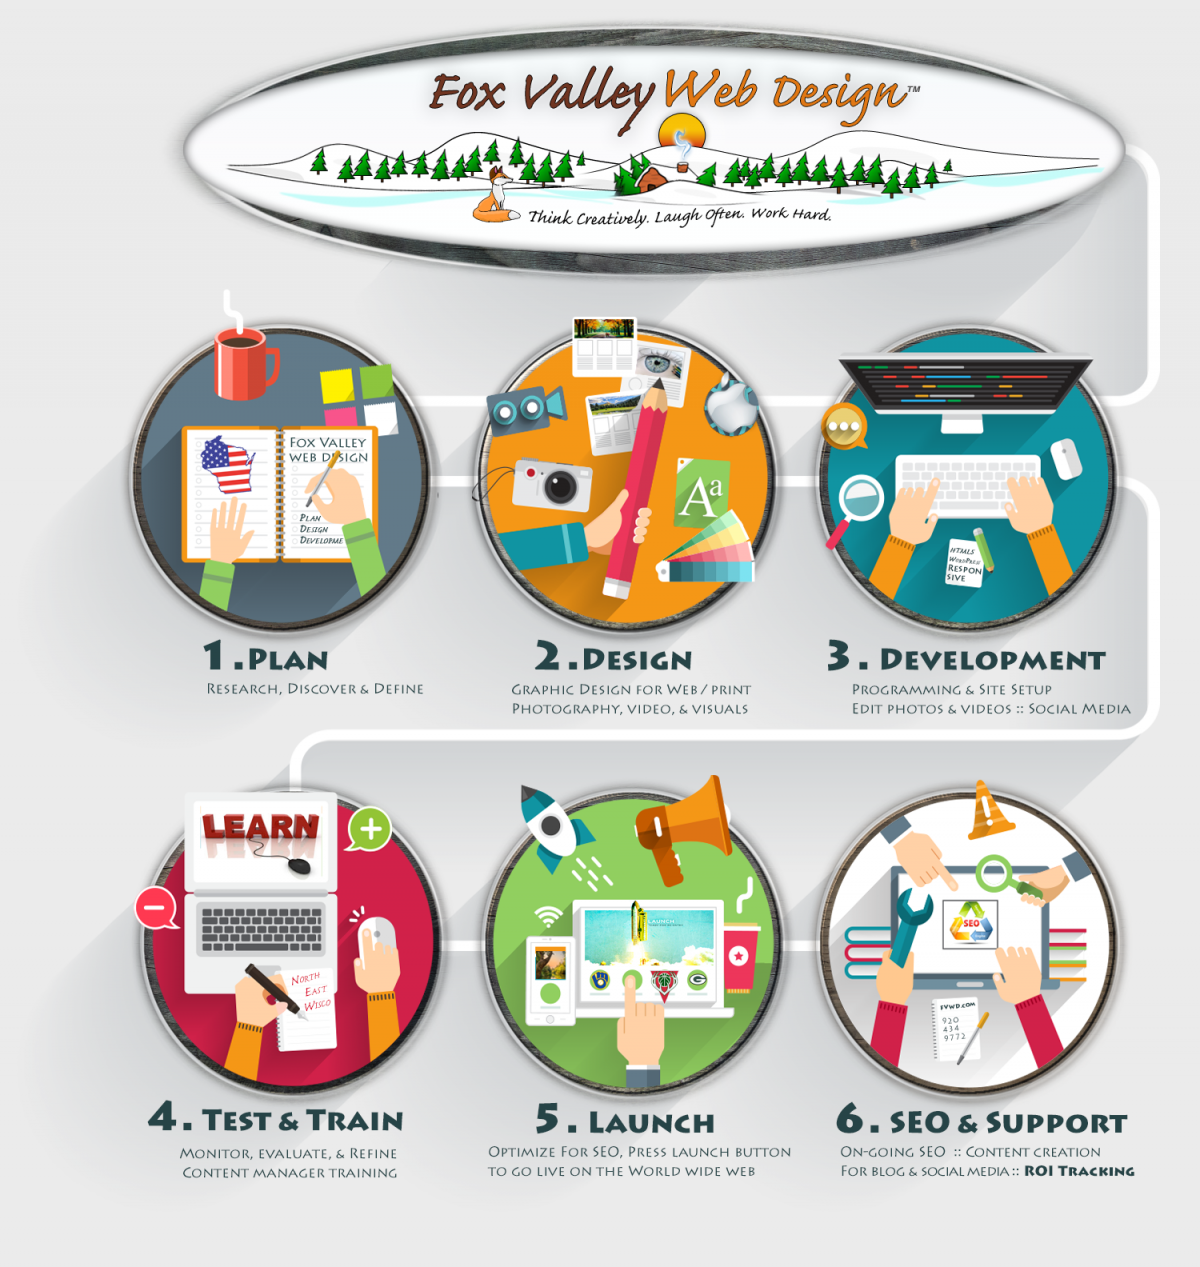 Fox Valley Web Design, web designer, webdesign, seo optimization, design a logo,brand marketing, seo expert, best website design, design logo, web design and development,process,fvwd,wisconsin website designers,american web design